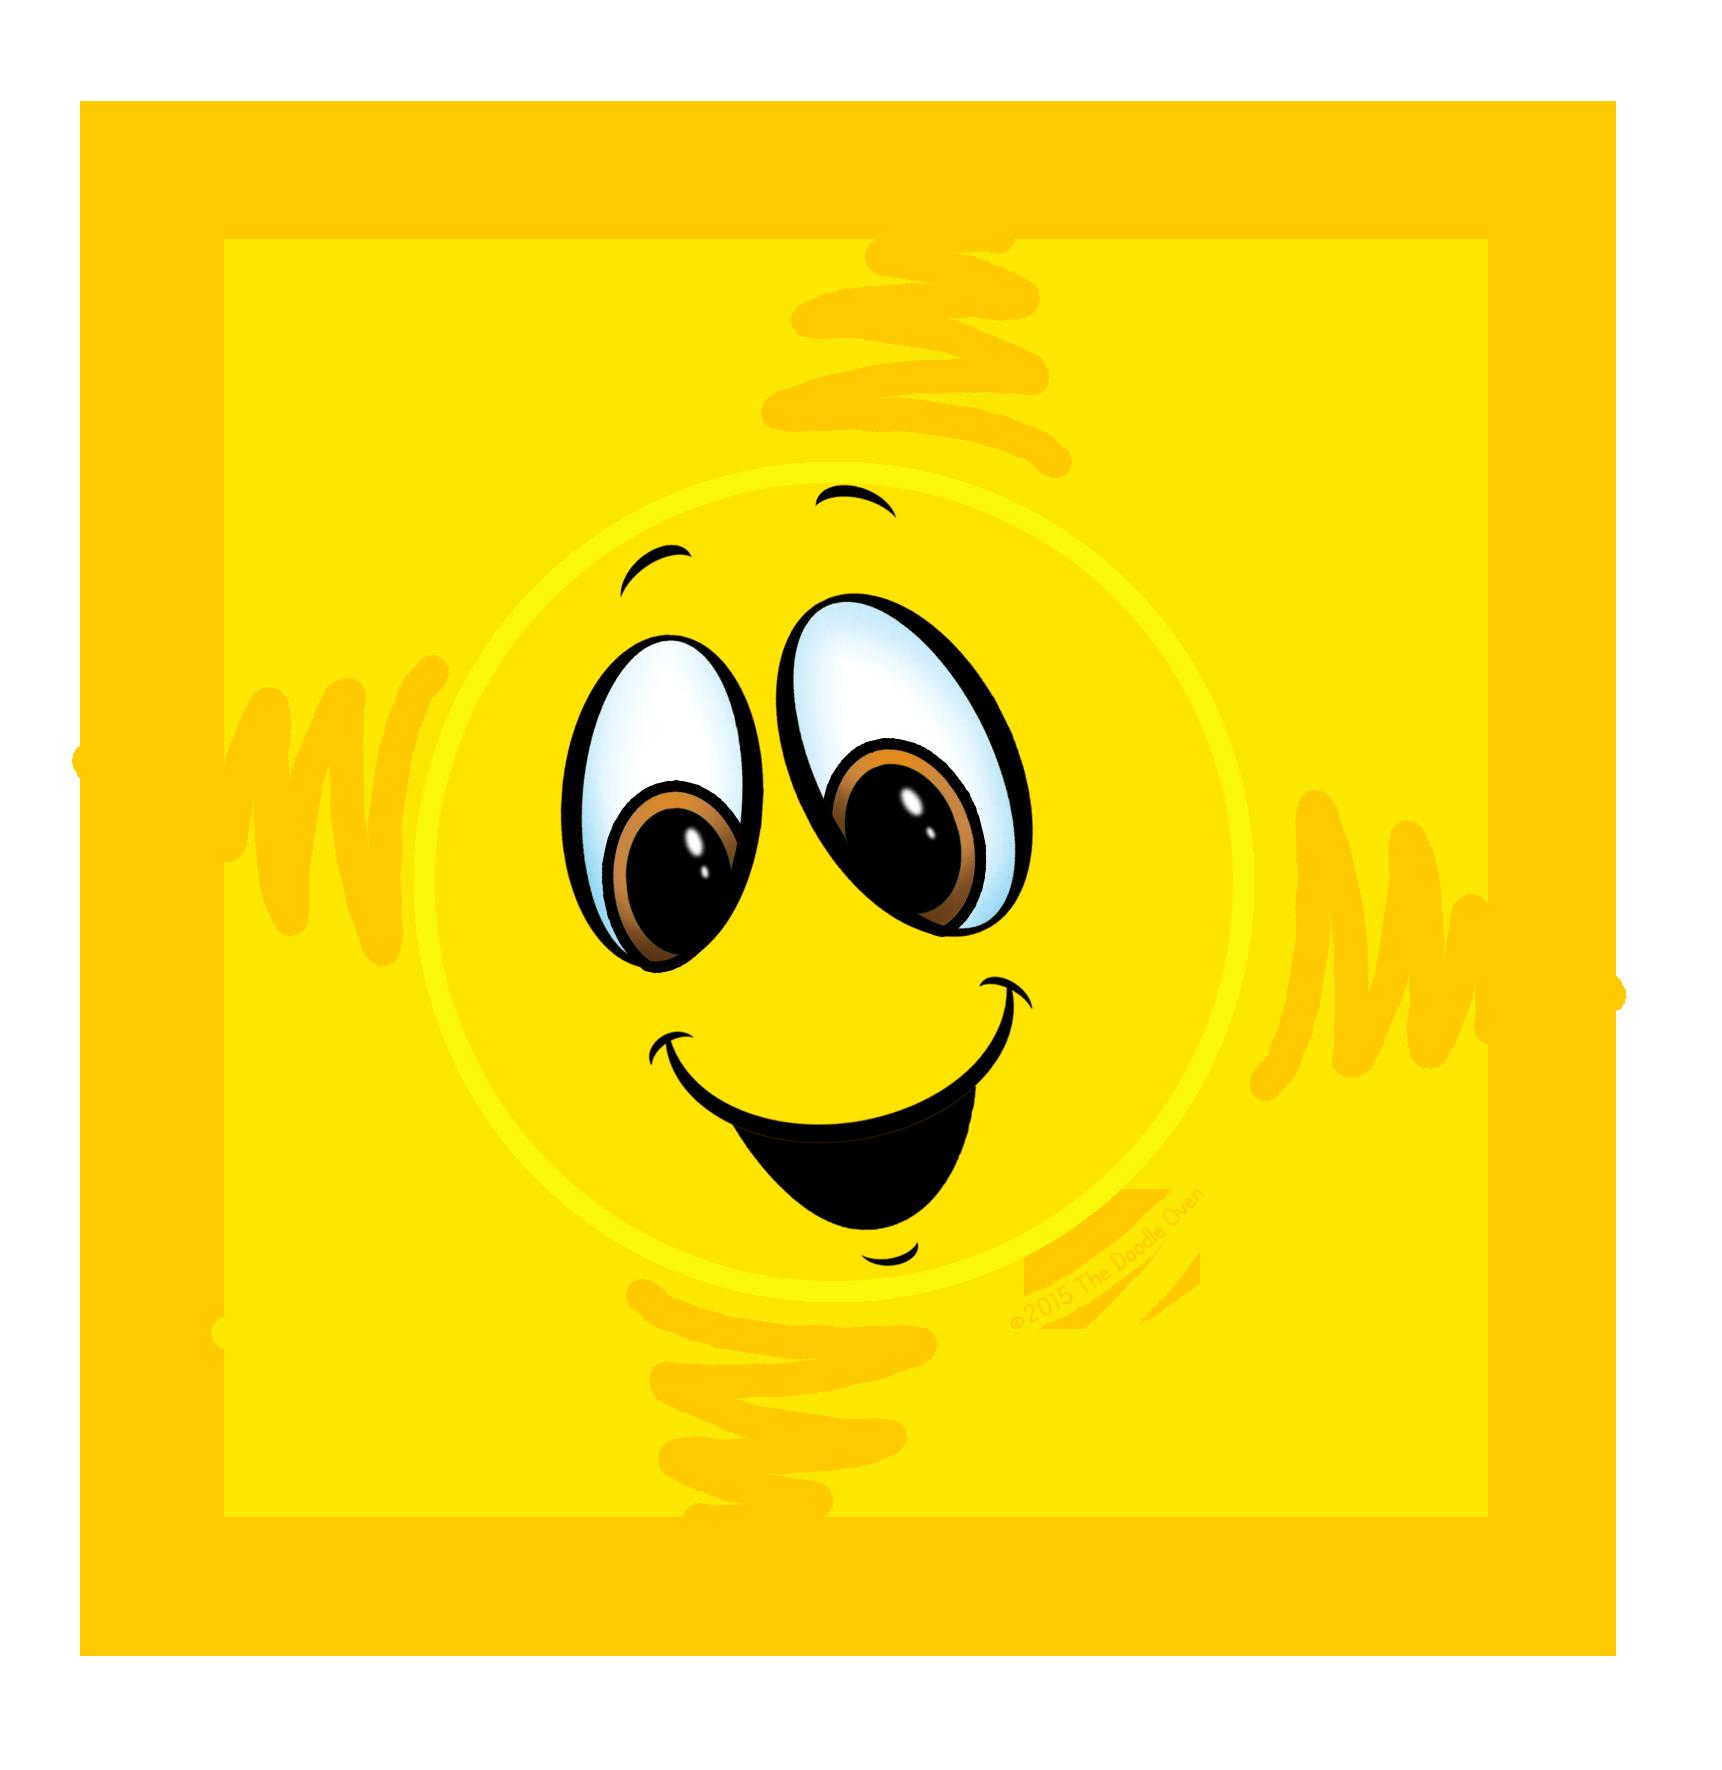 Clipart sun side. Pin by tatiana grigoras